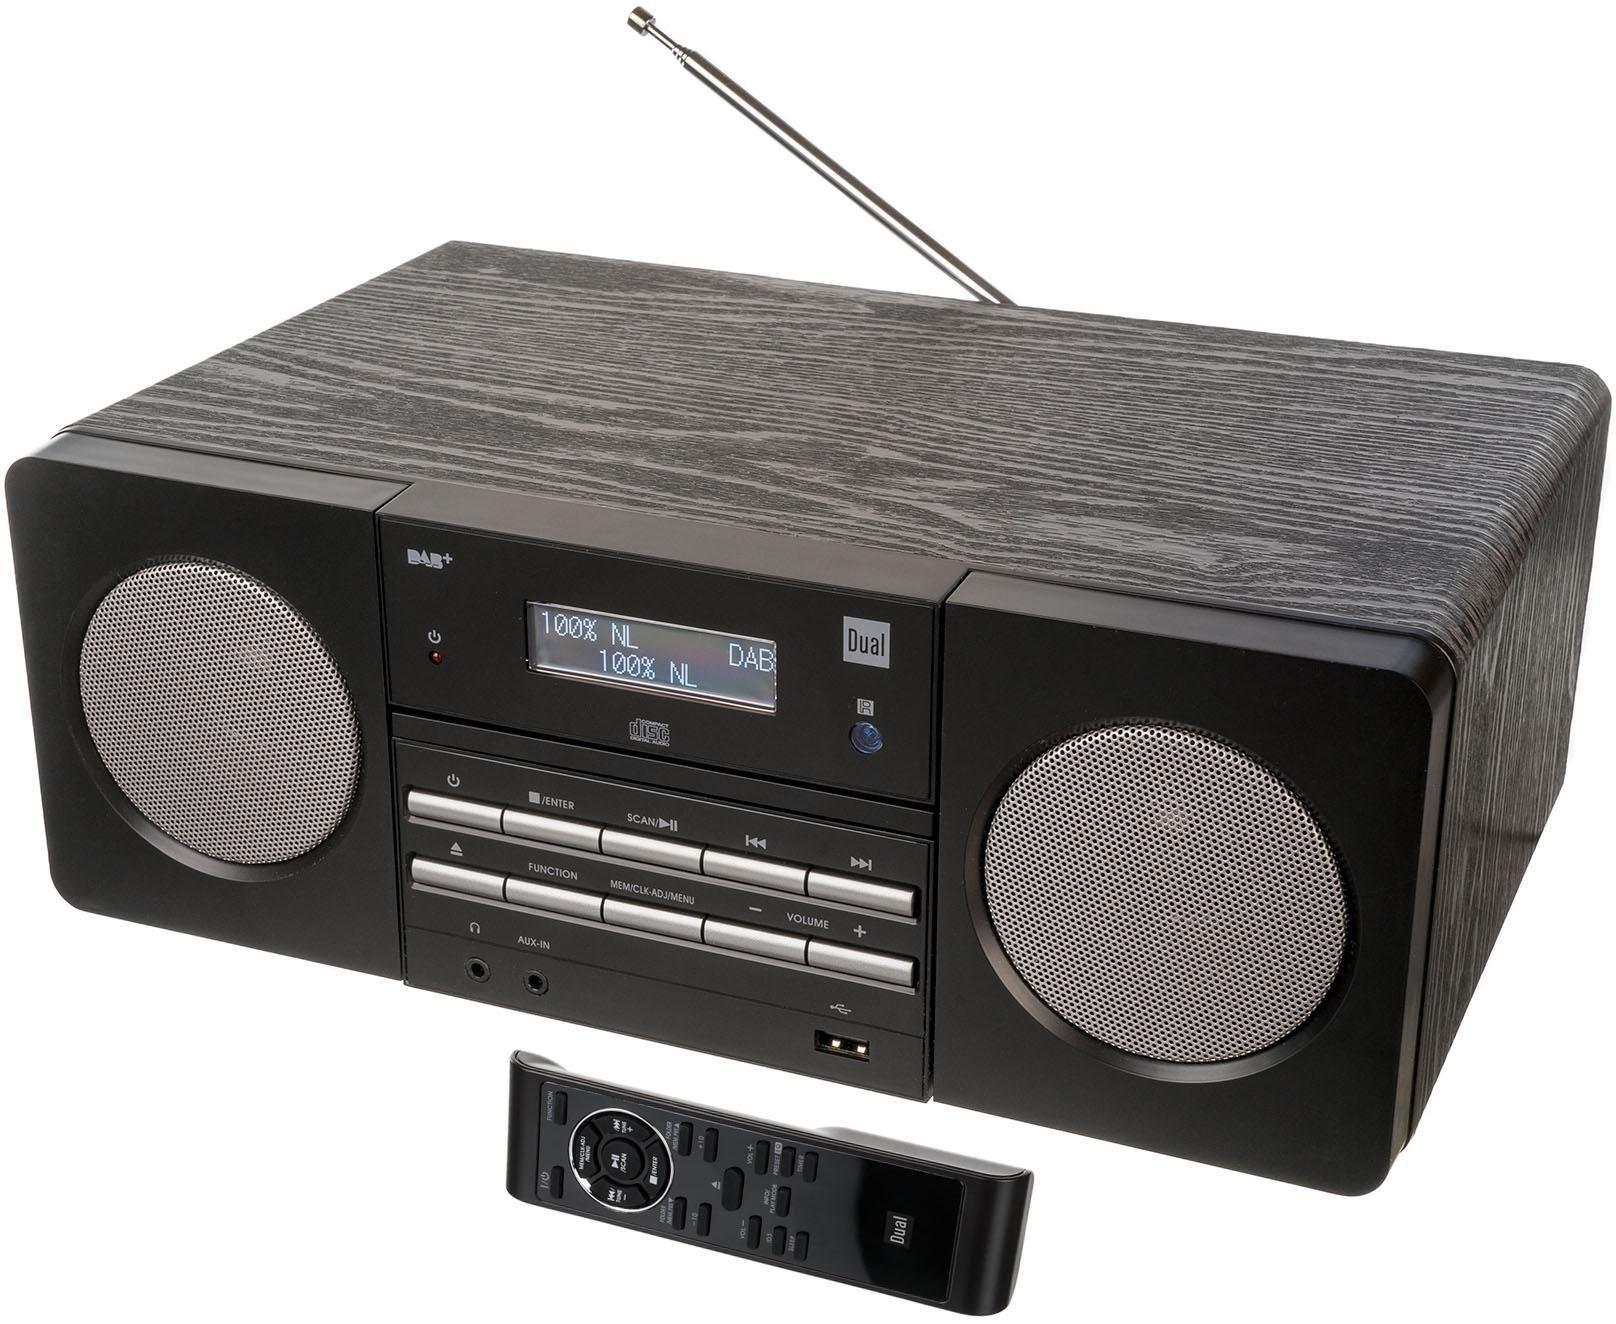 Dual DAB 410 Microanlage, Digitalradio (DAB+), RDS, 1x USB